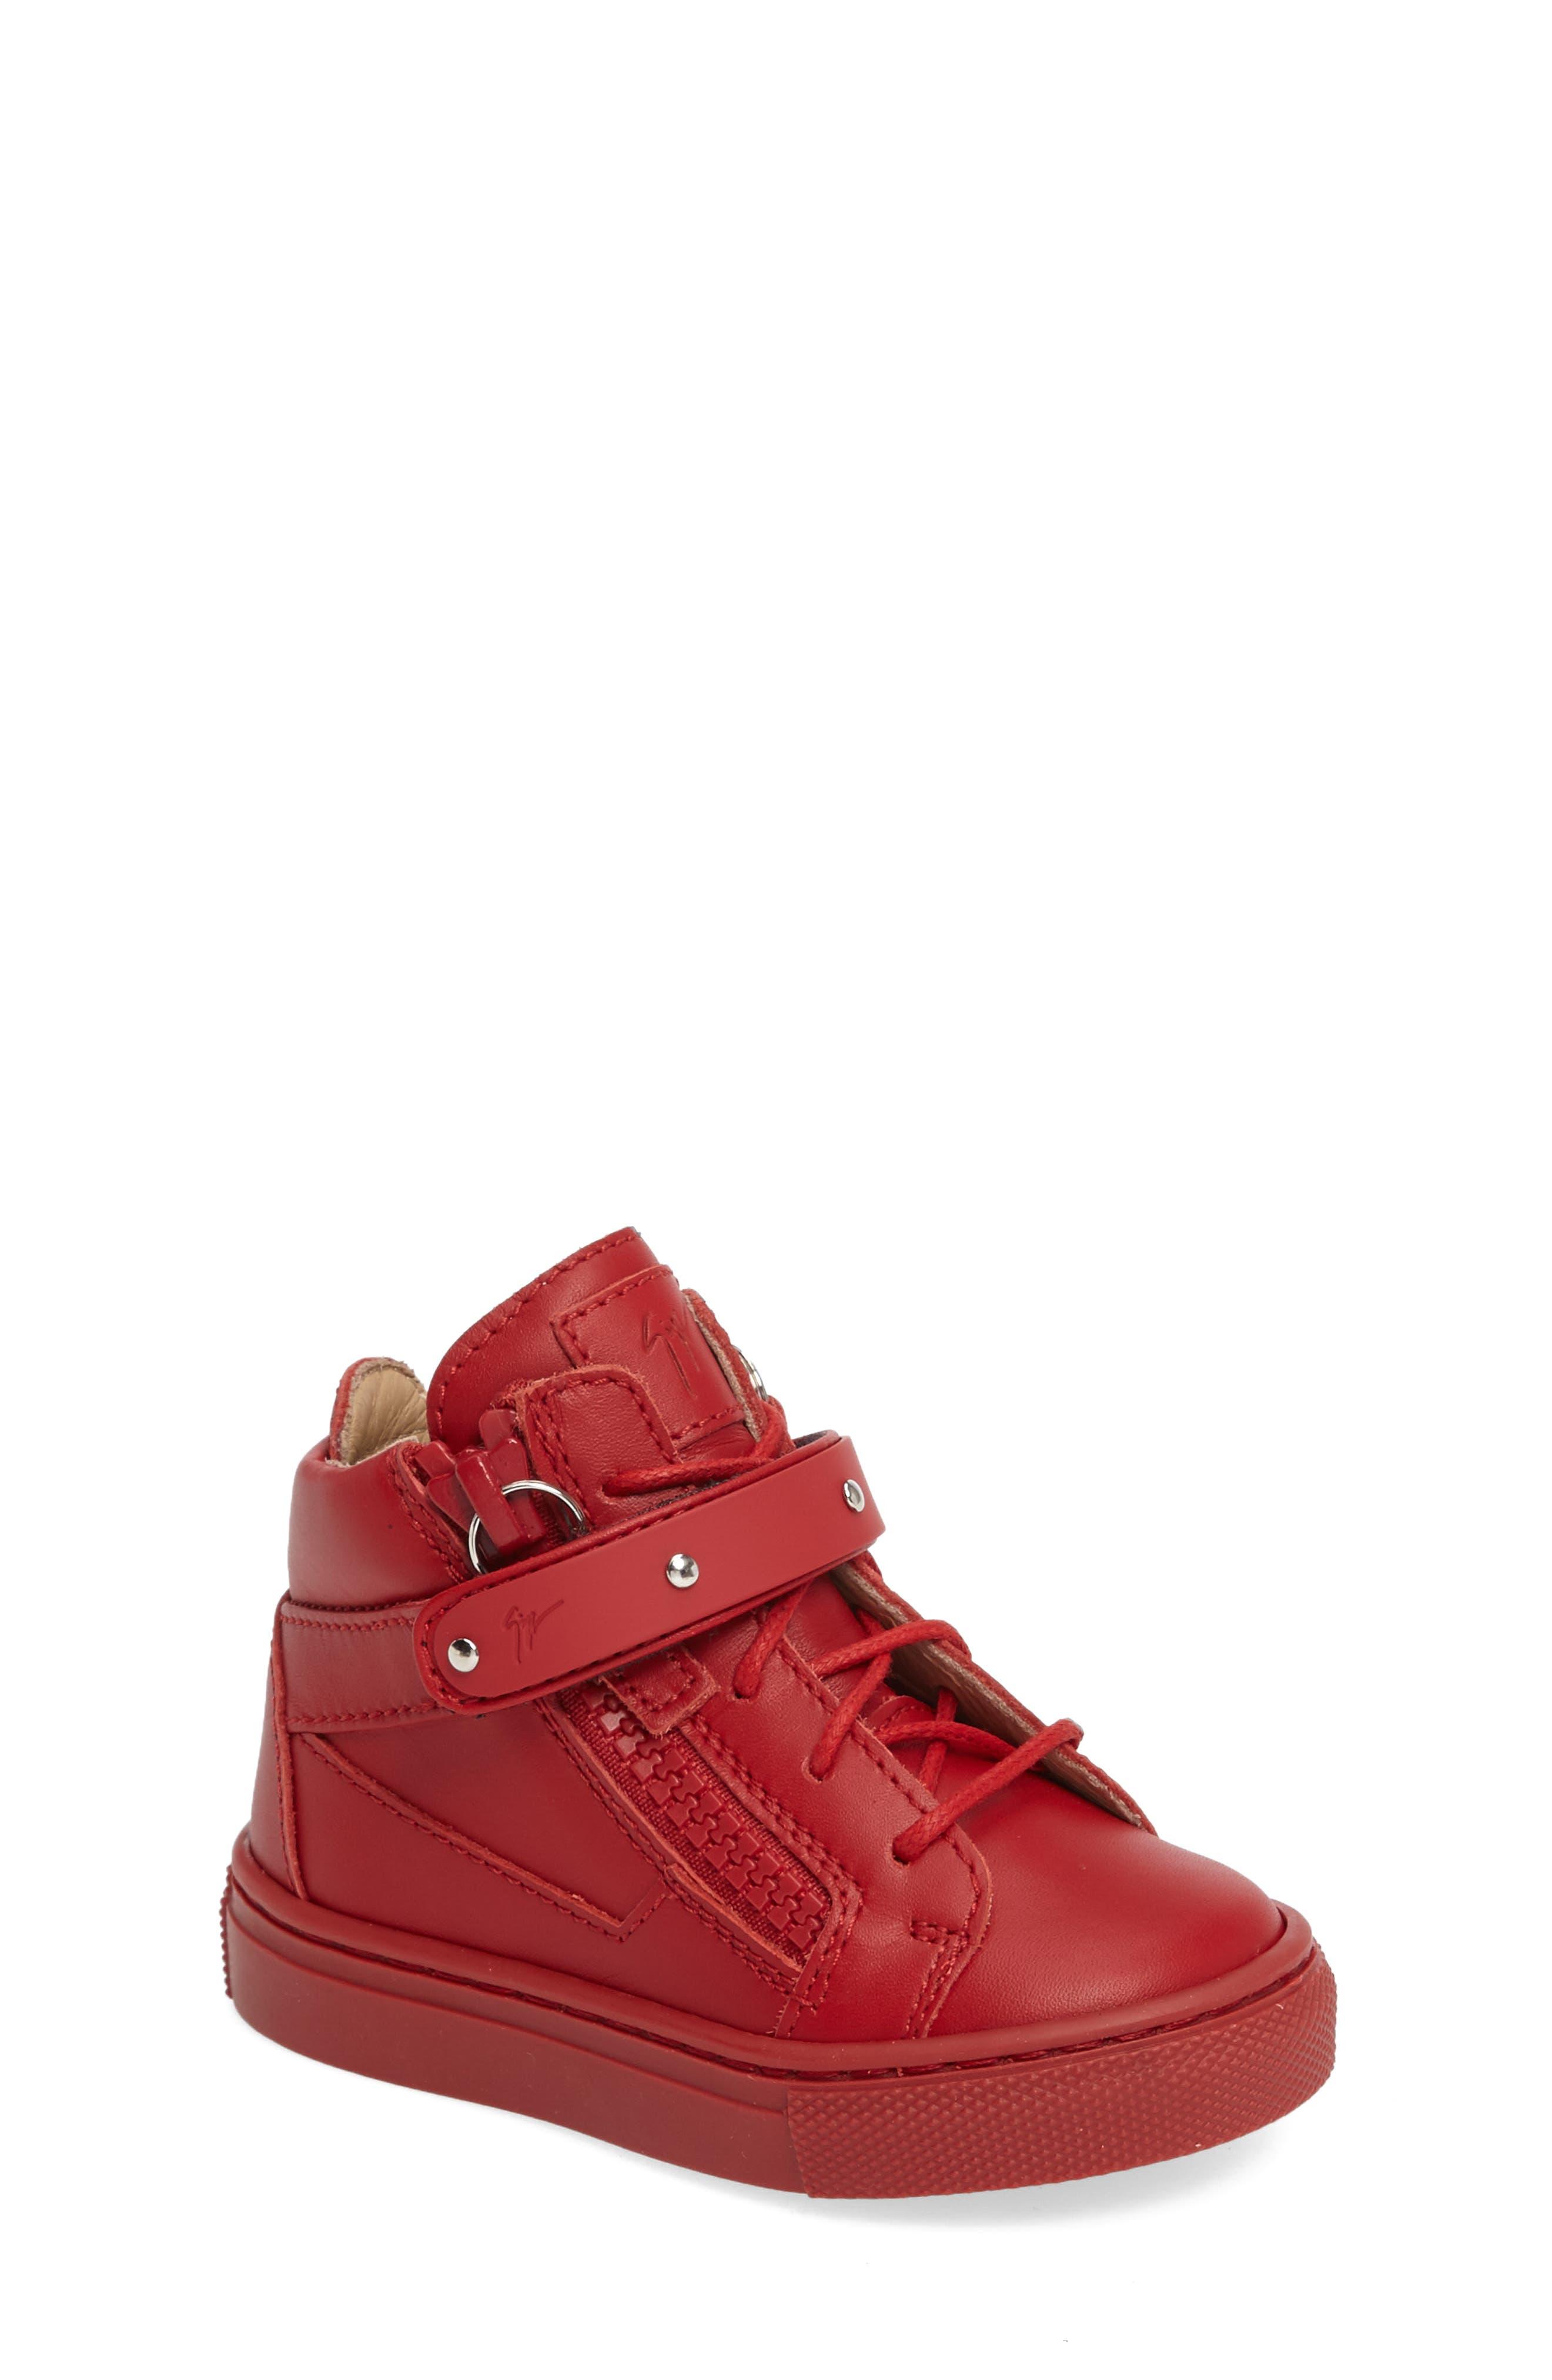 Giuseppe Zanotti Taylor Junior High Top Sneaker (Baby, Walker, Toddler & Little Kid)